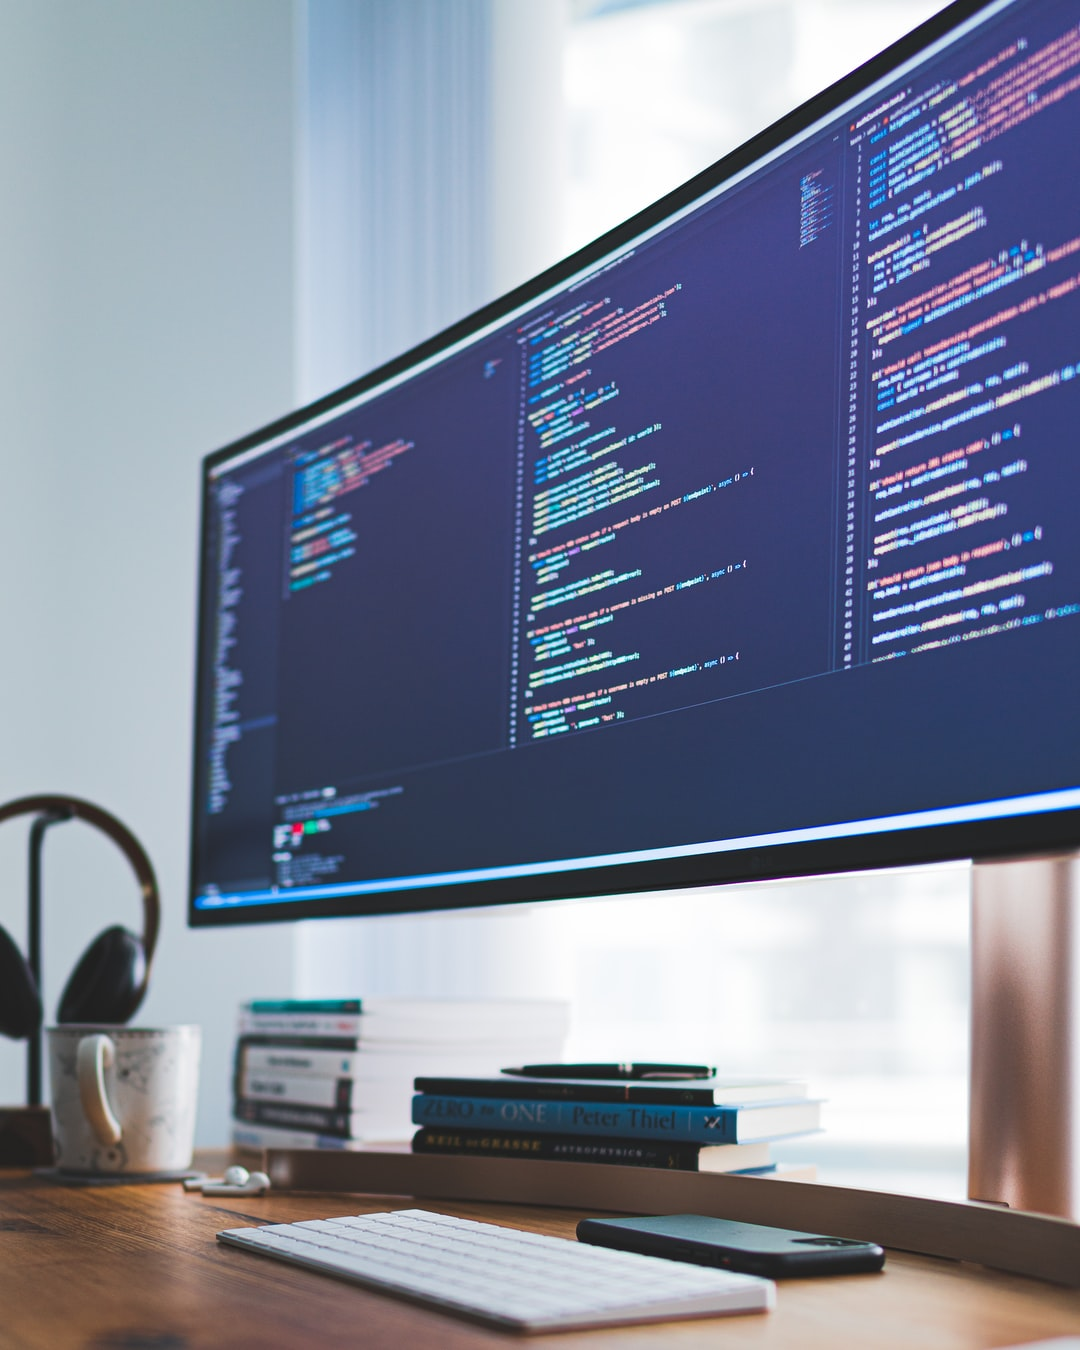 Desktop screen with code for software development